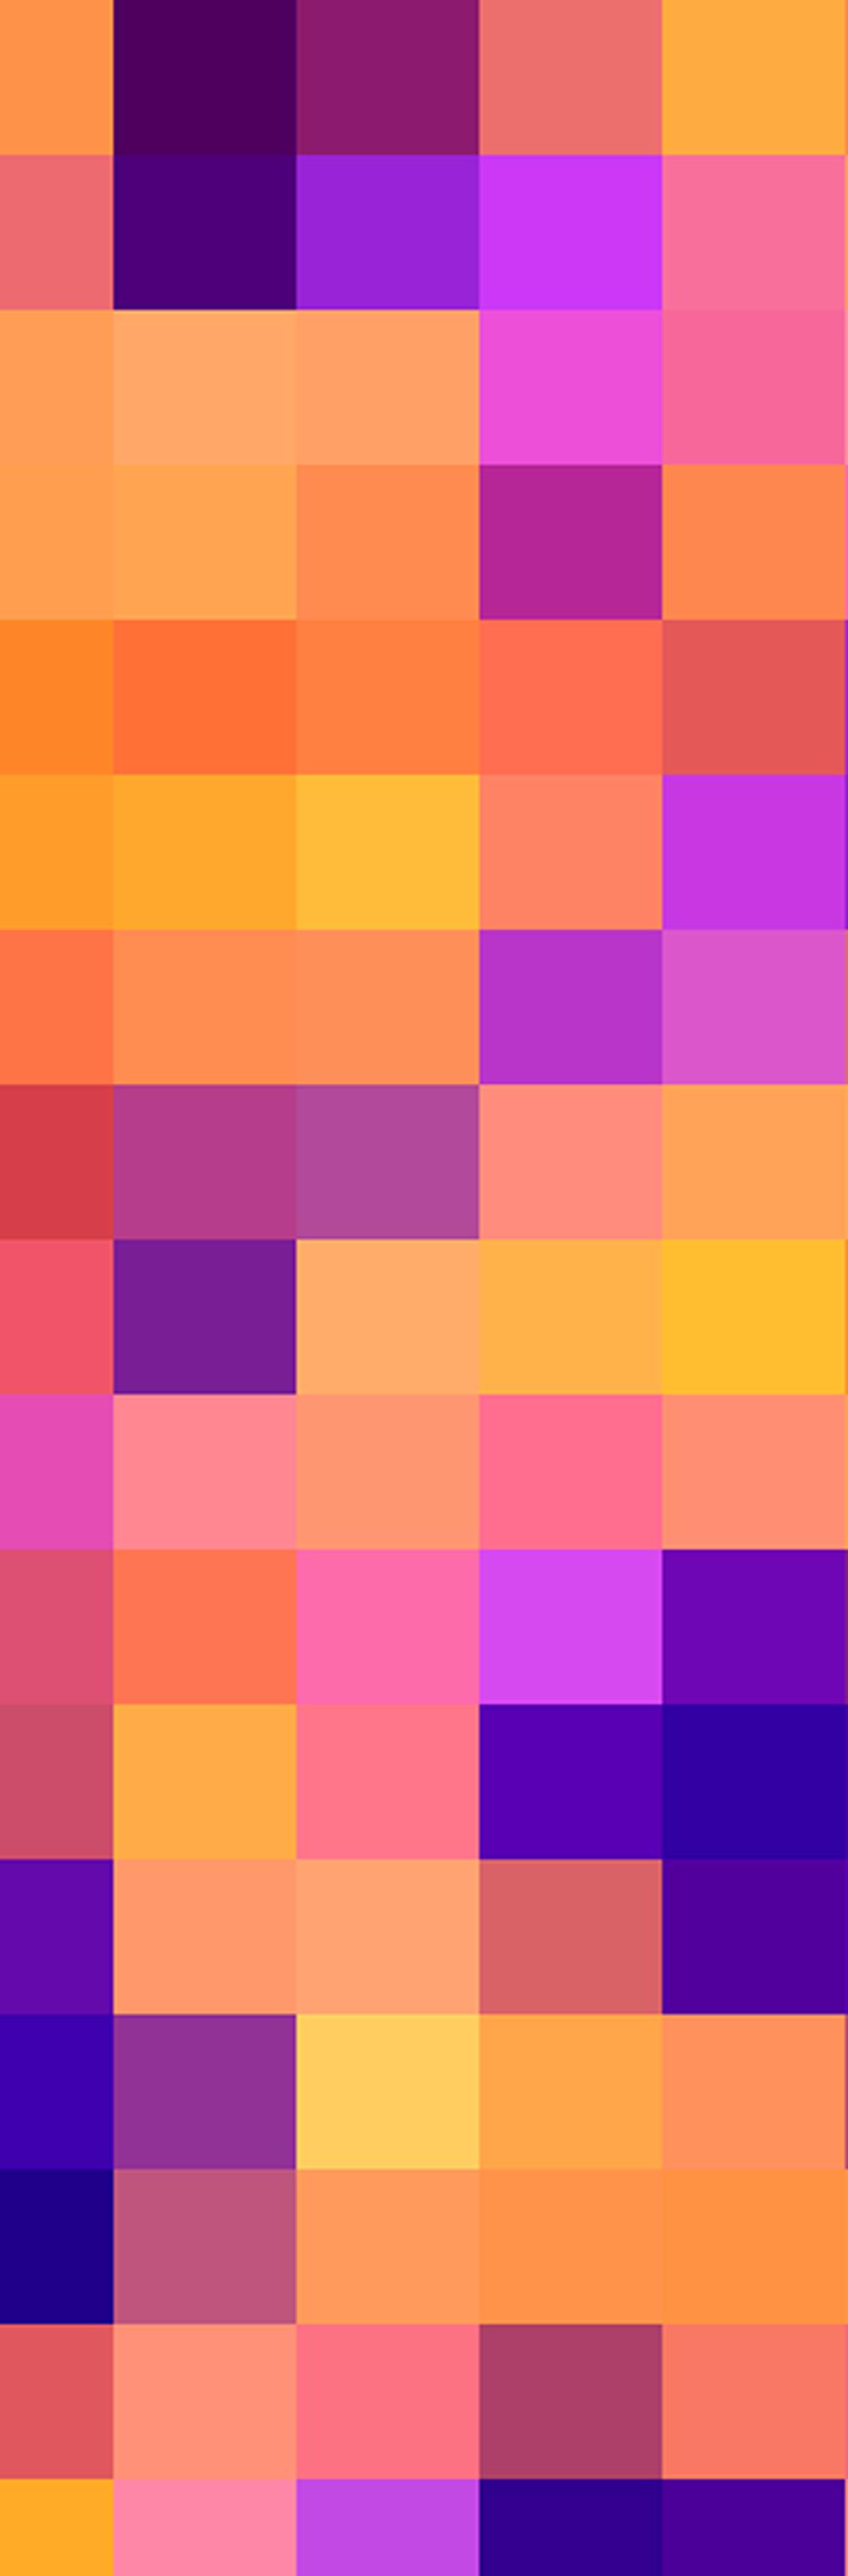 MB Pixel 5-120